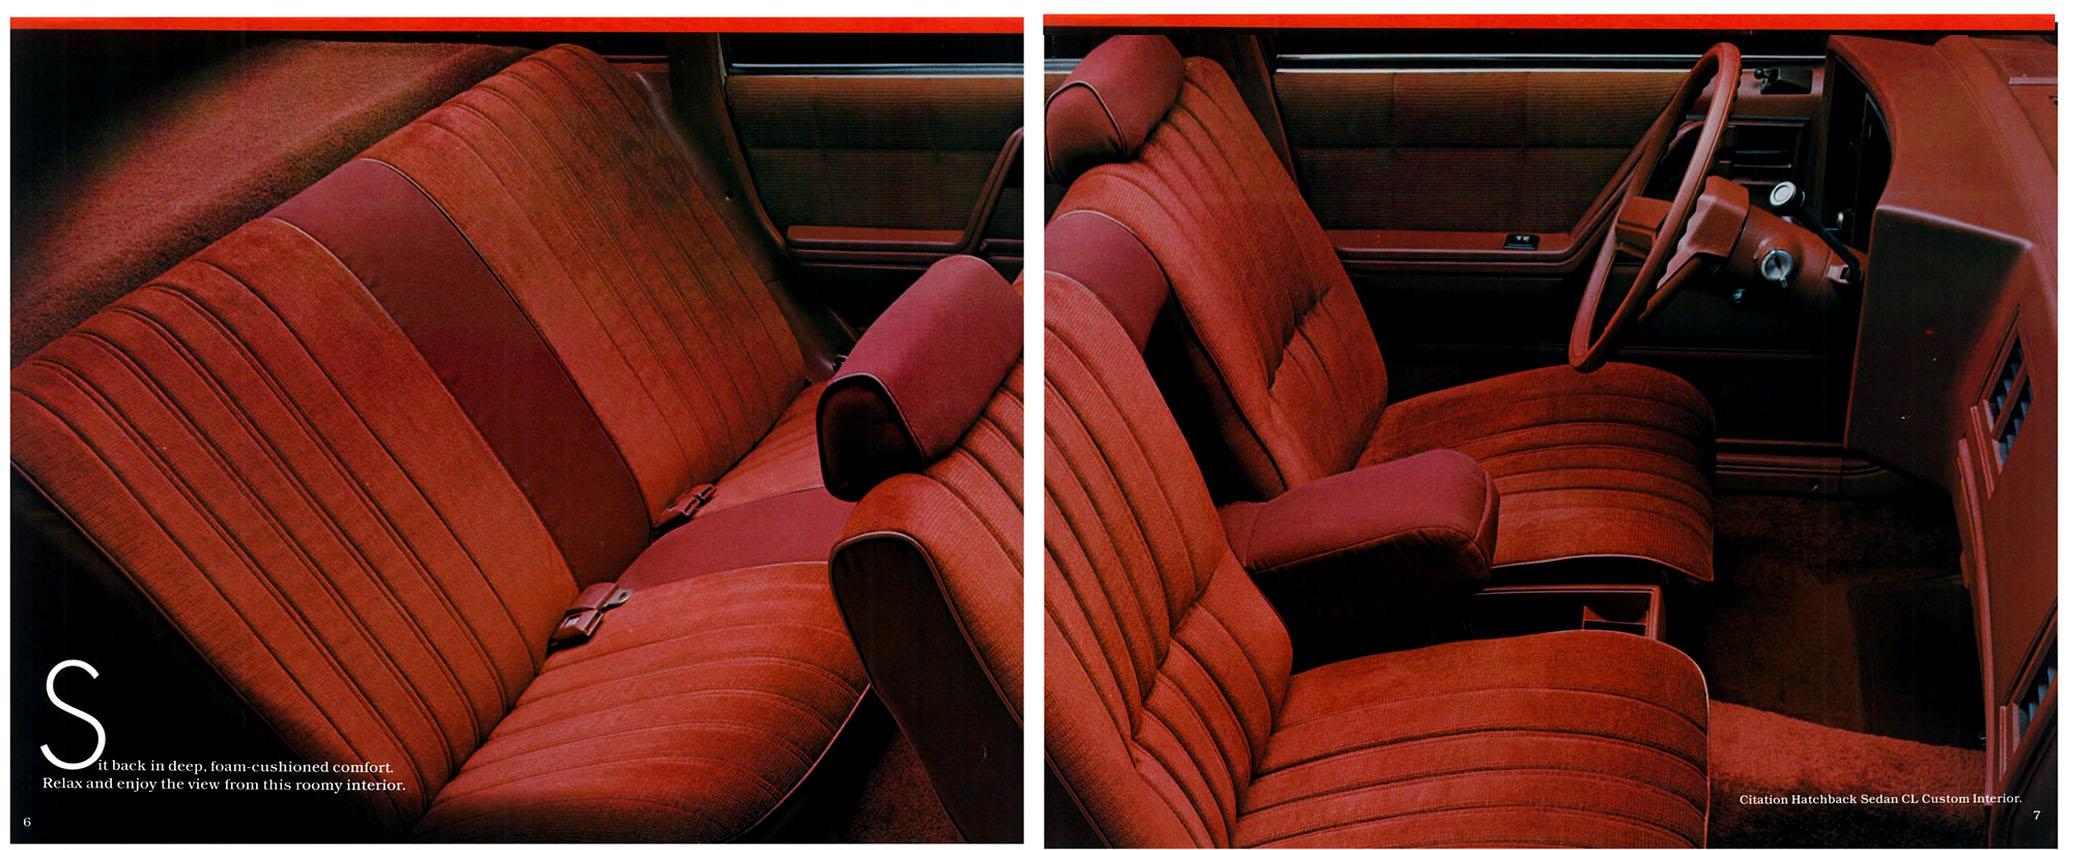 1983 Chevrolet Citation Chevrolet